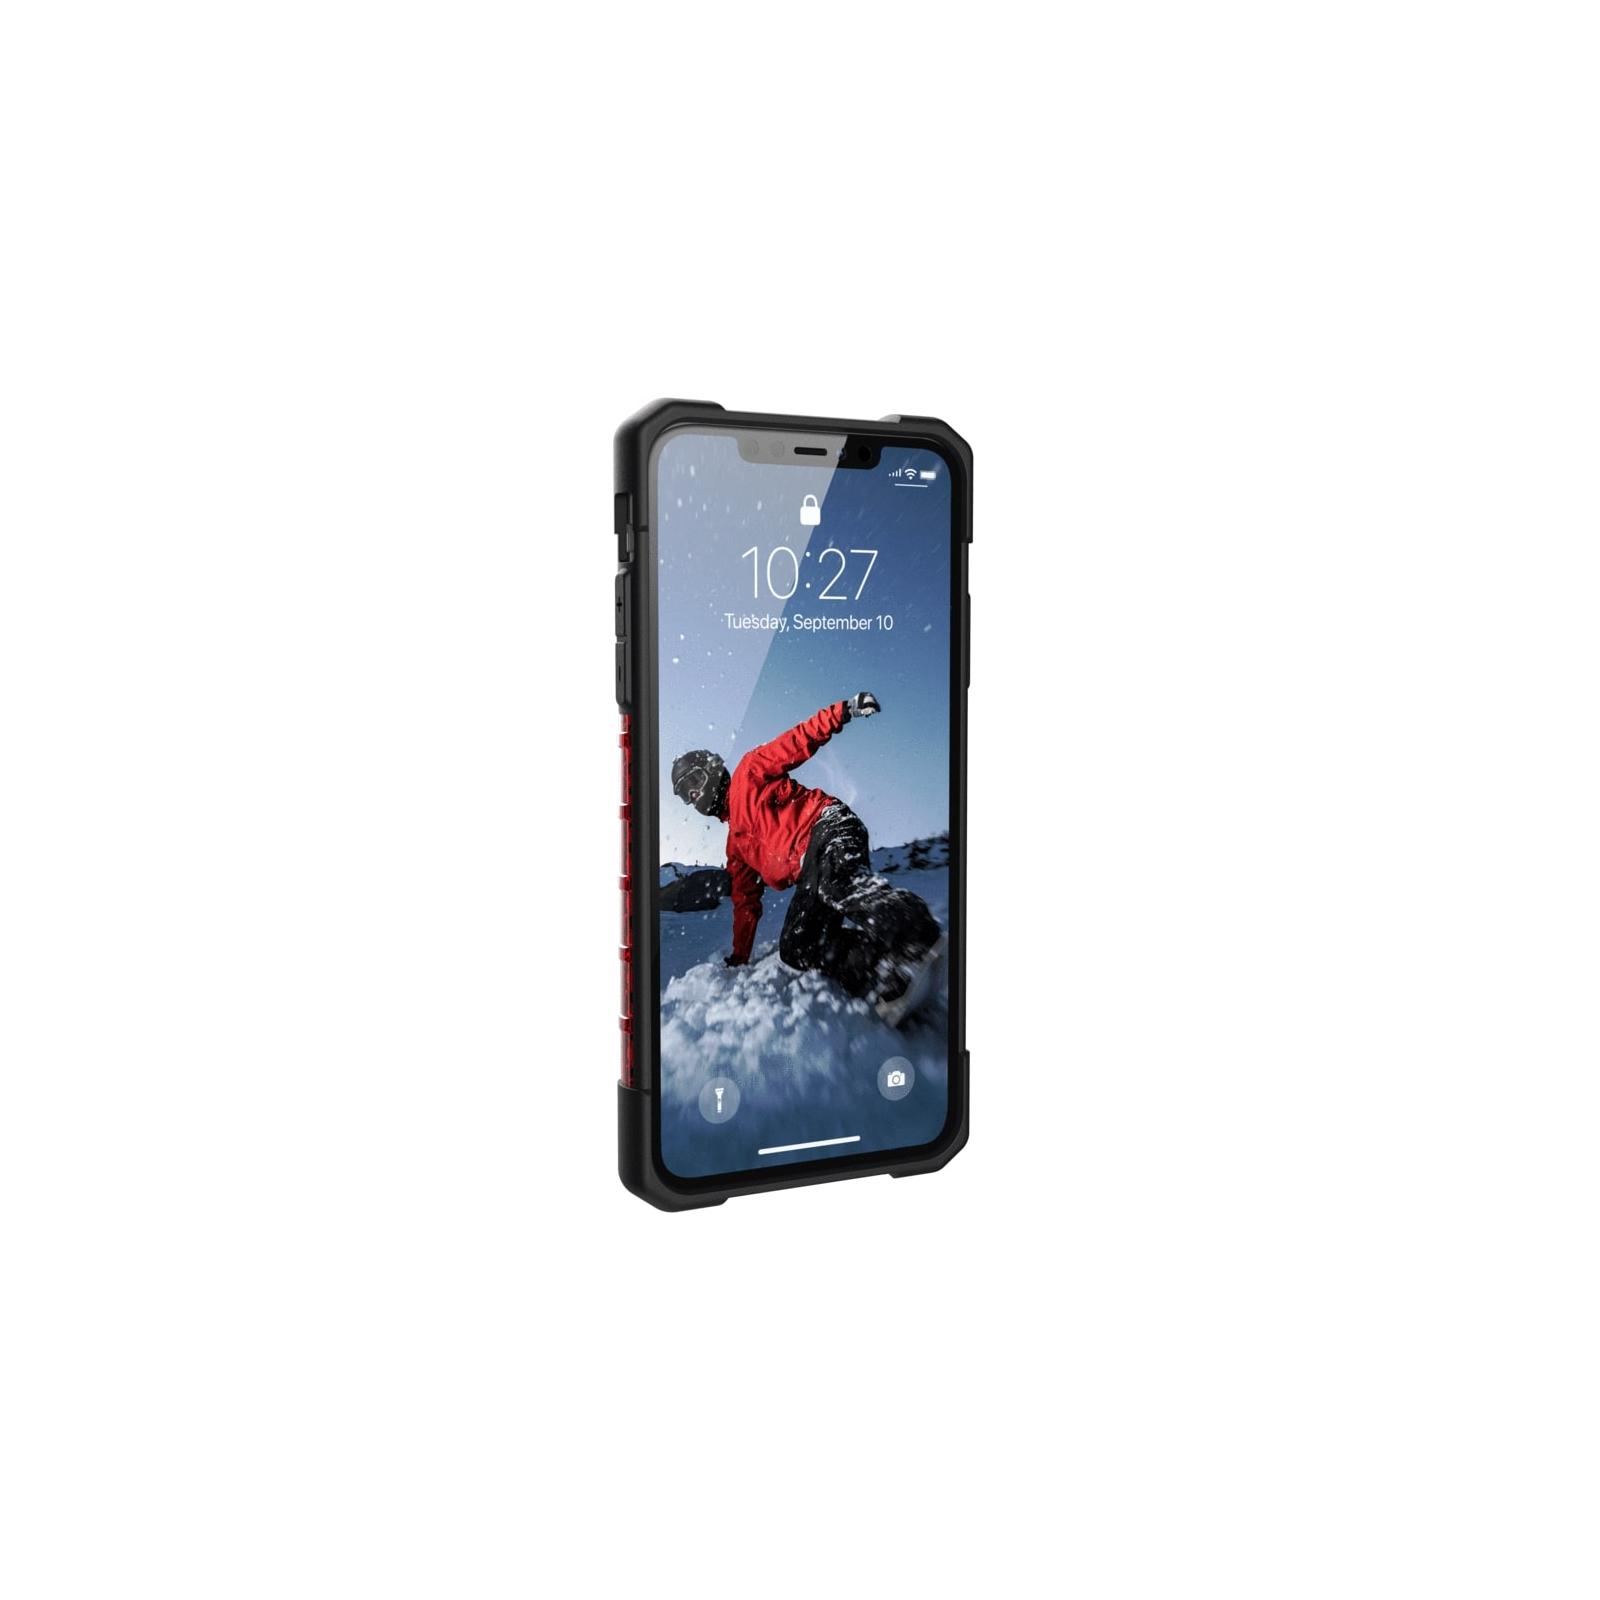 Чехол для моб. телефона Uag iPhone 11 Pro Max Plasma, Magma (111723119393) изображение 5